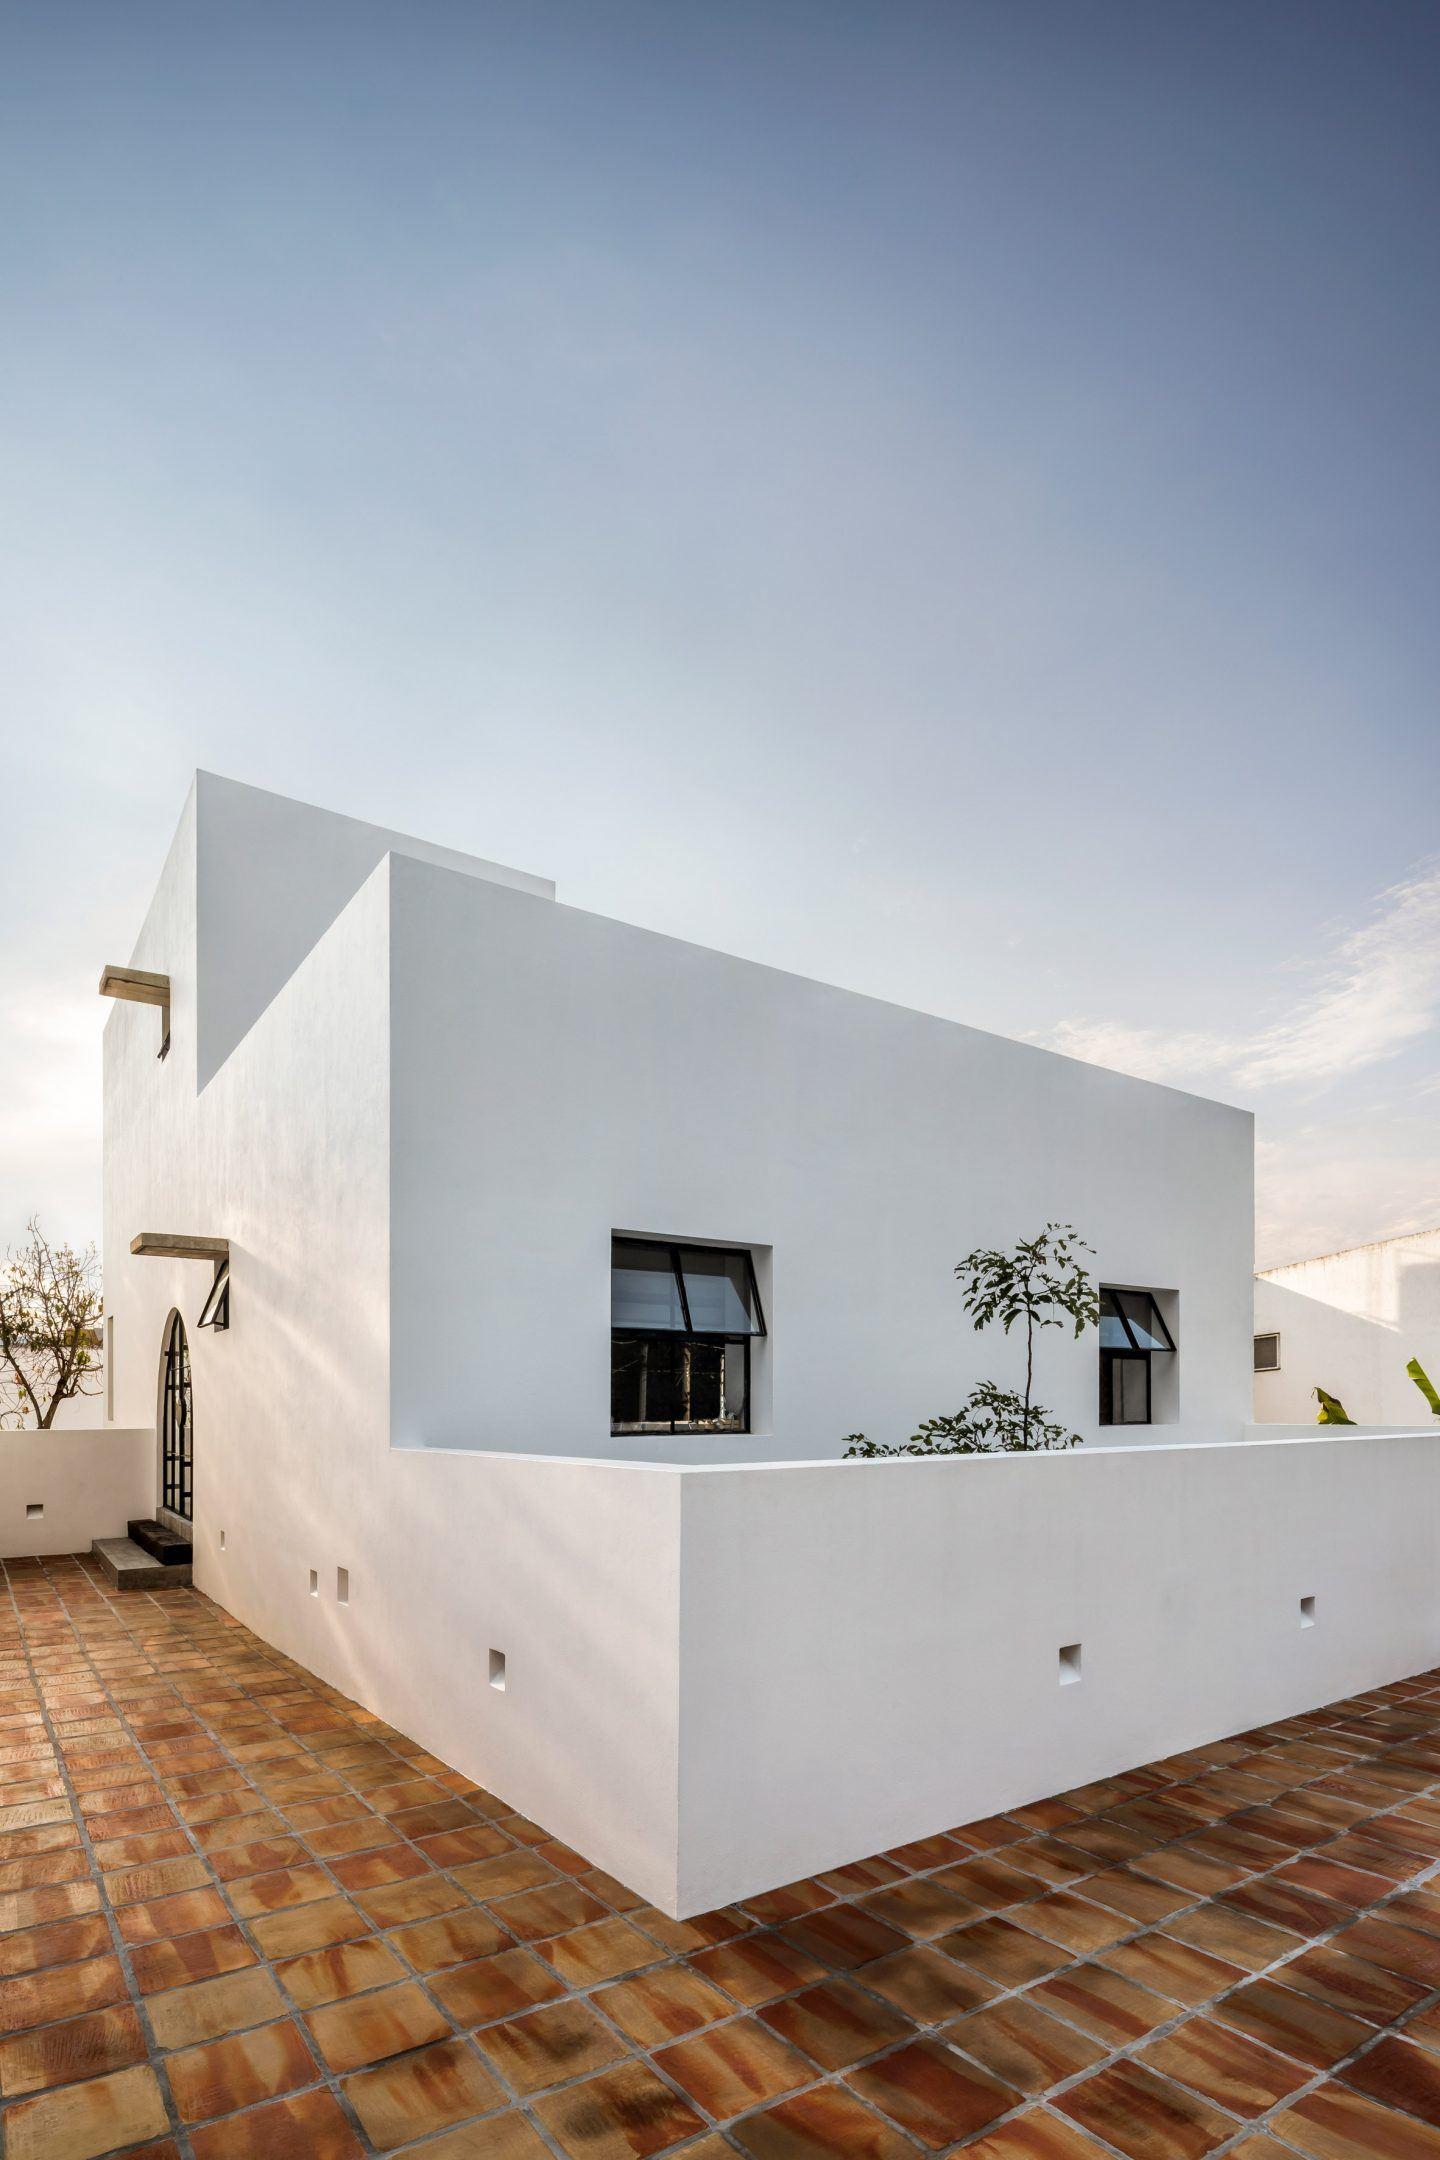 IGNANT-Architecture-Delfino-Lozano-Cesar-Bejar-Casa-690-06